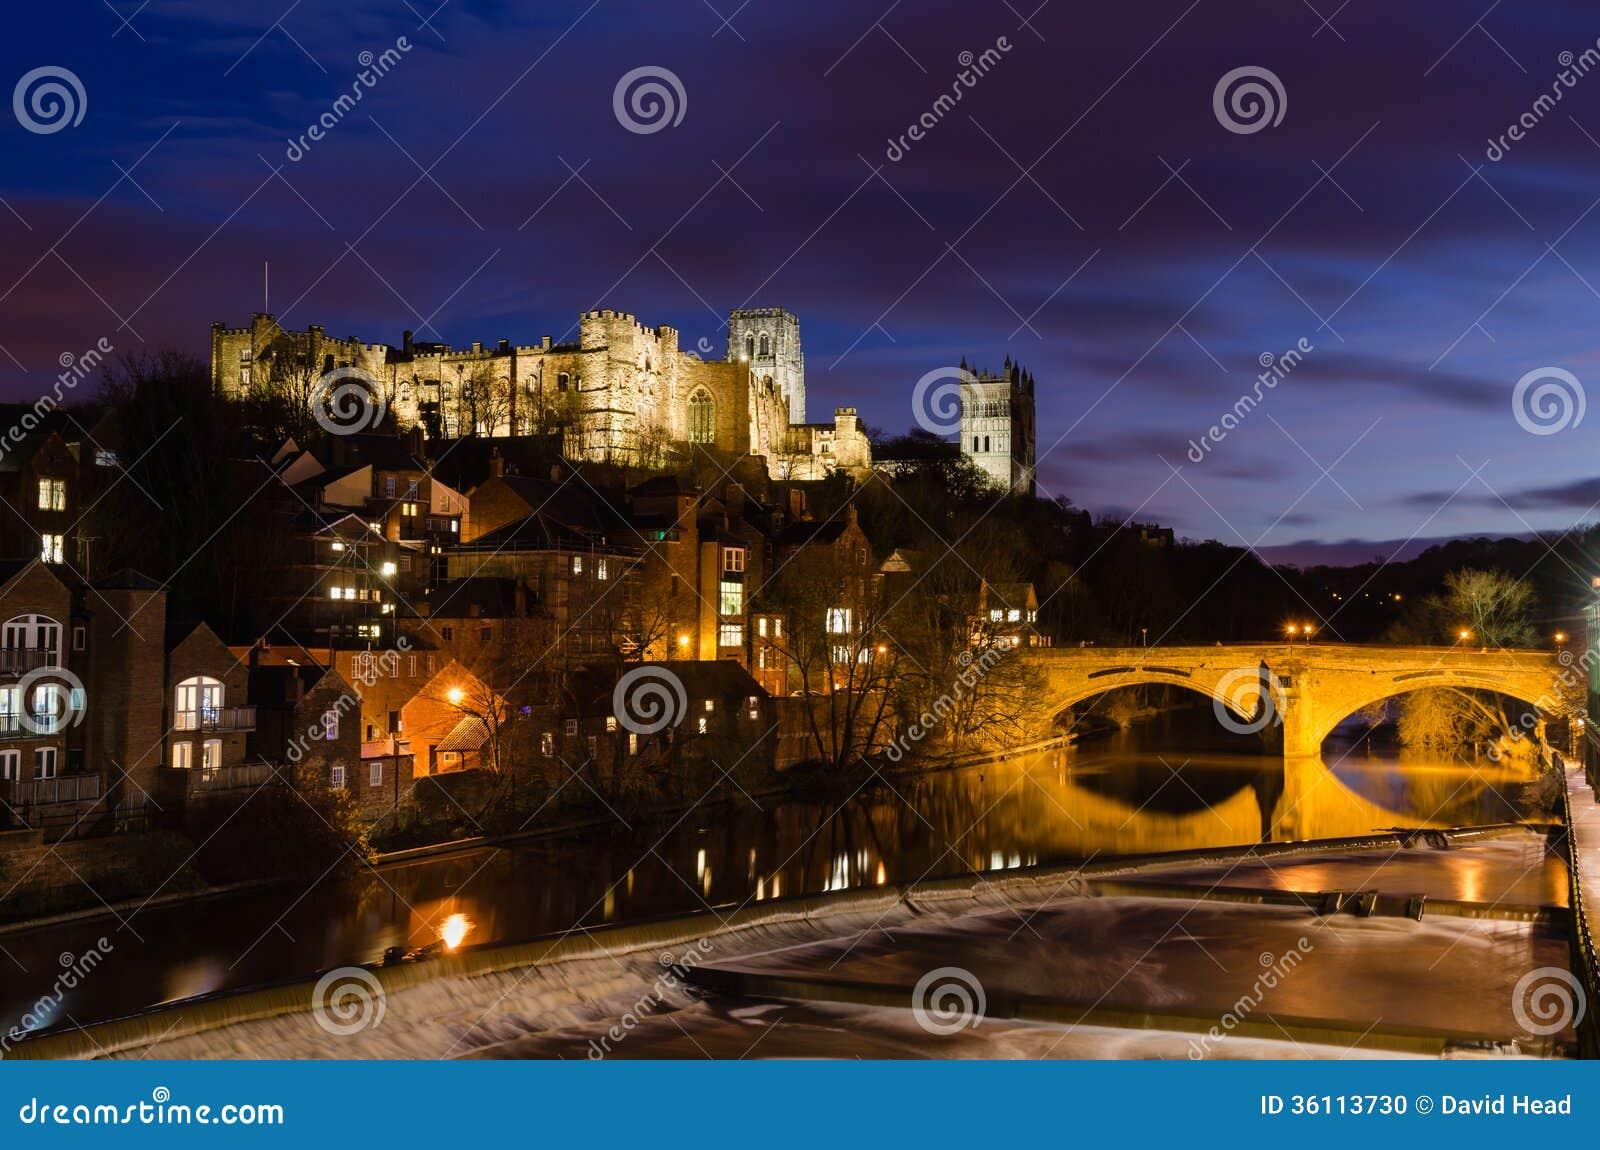 Durham City At Night Stock Photo Image Of Clouds Night 36113730